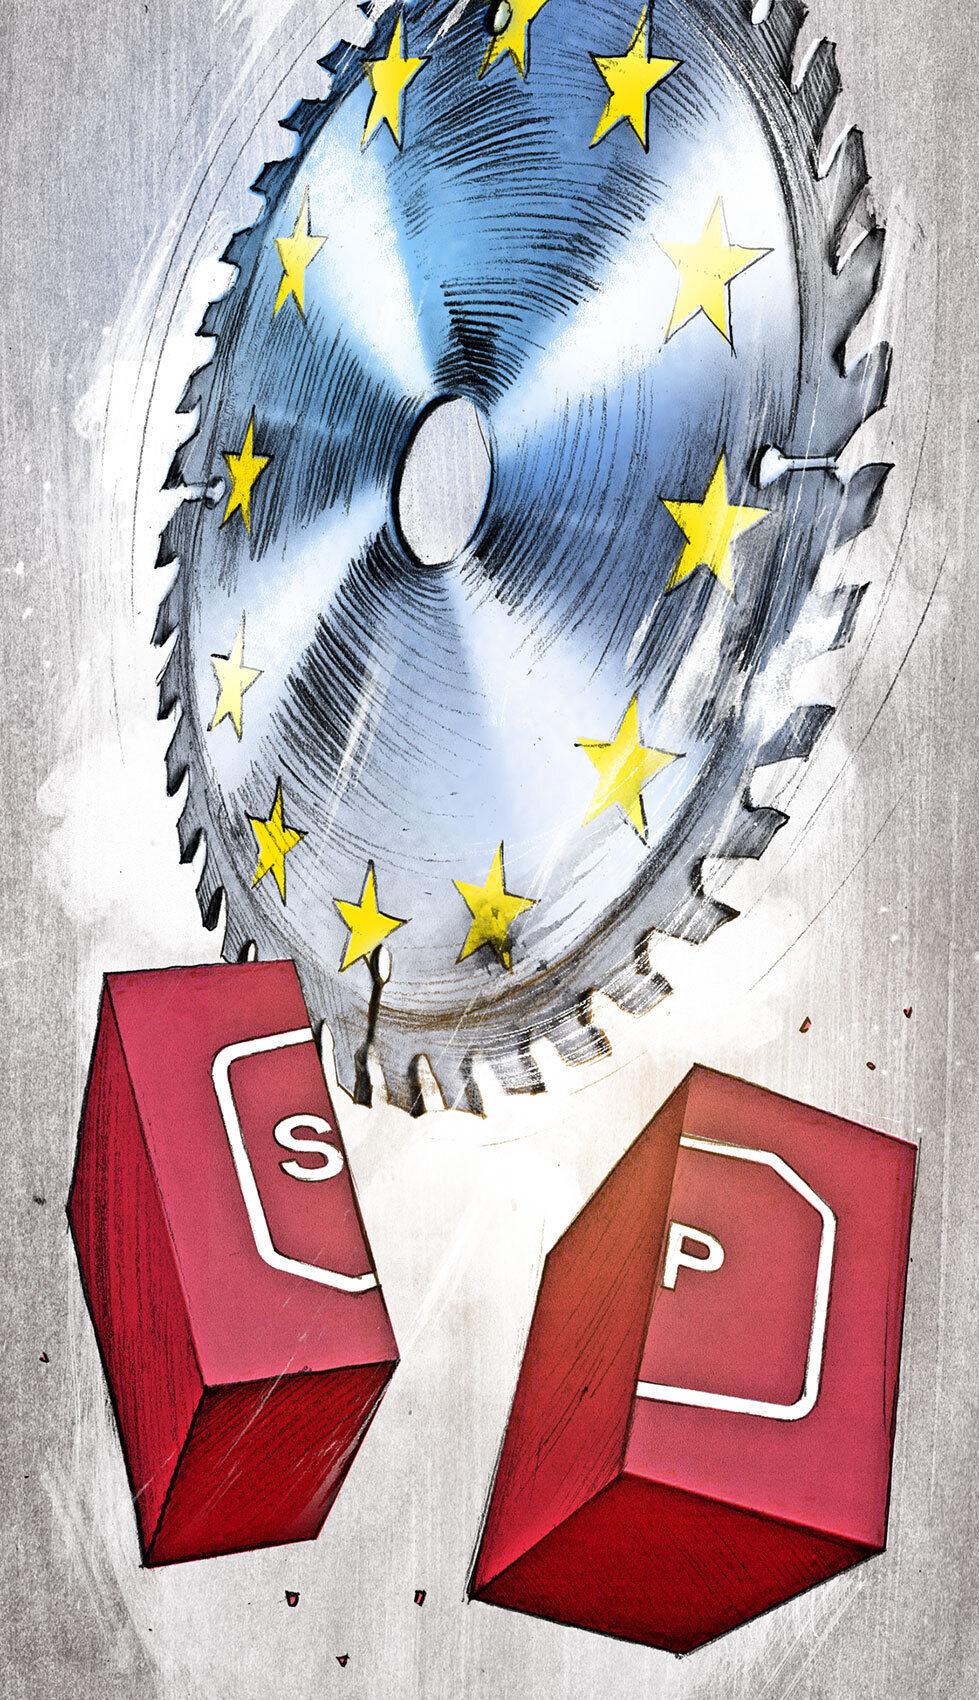 SP EU - Kornel Illustration | Kornel Stadler portfolio